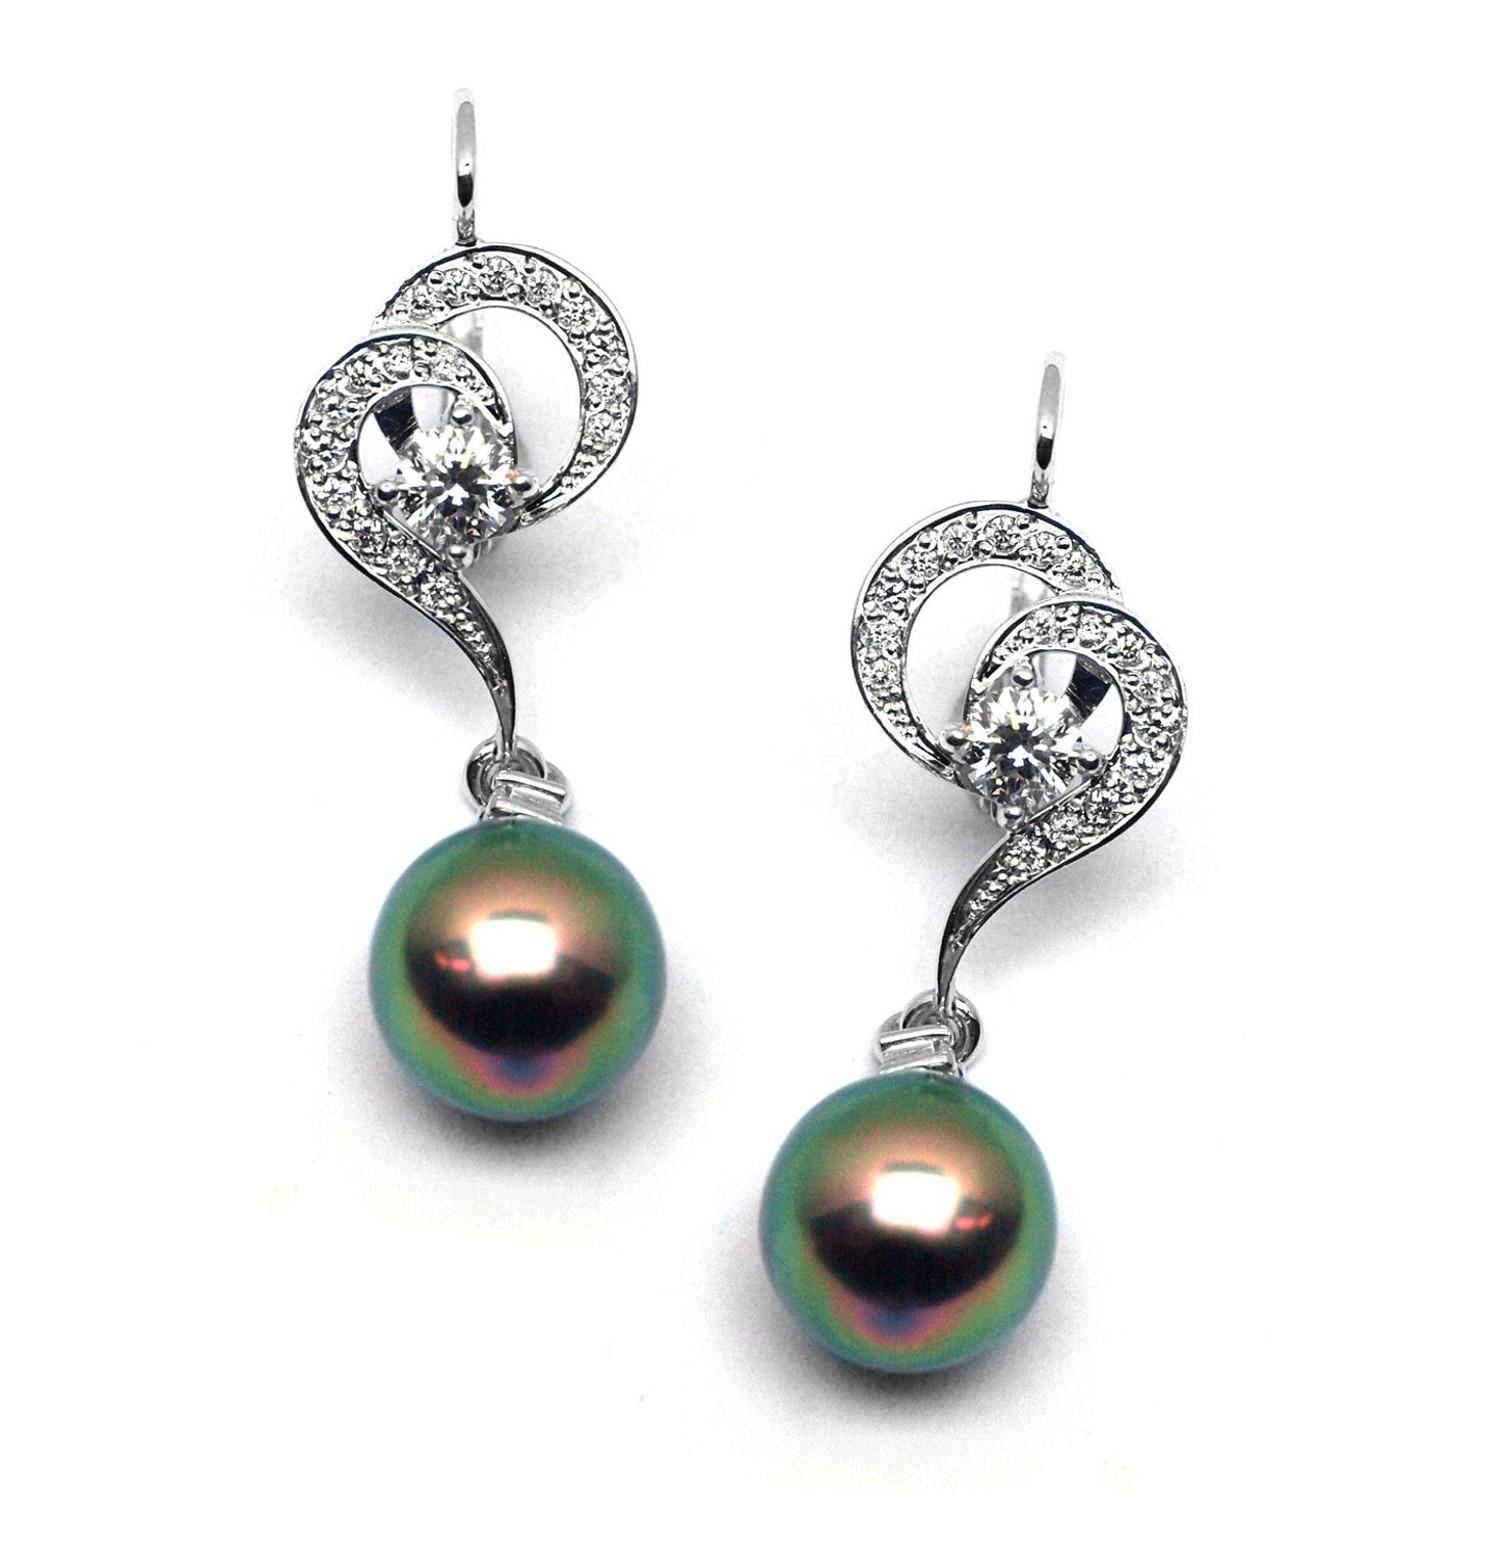 c1c5057cc Diamantové zlaté náušnice Náušnice s tahitskými perlami a diamanty  J-28334-17